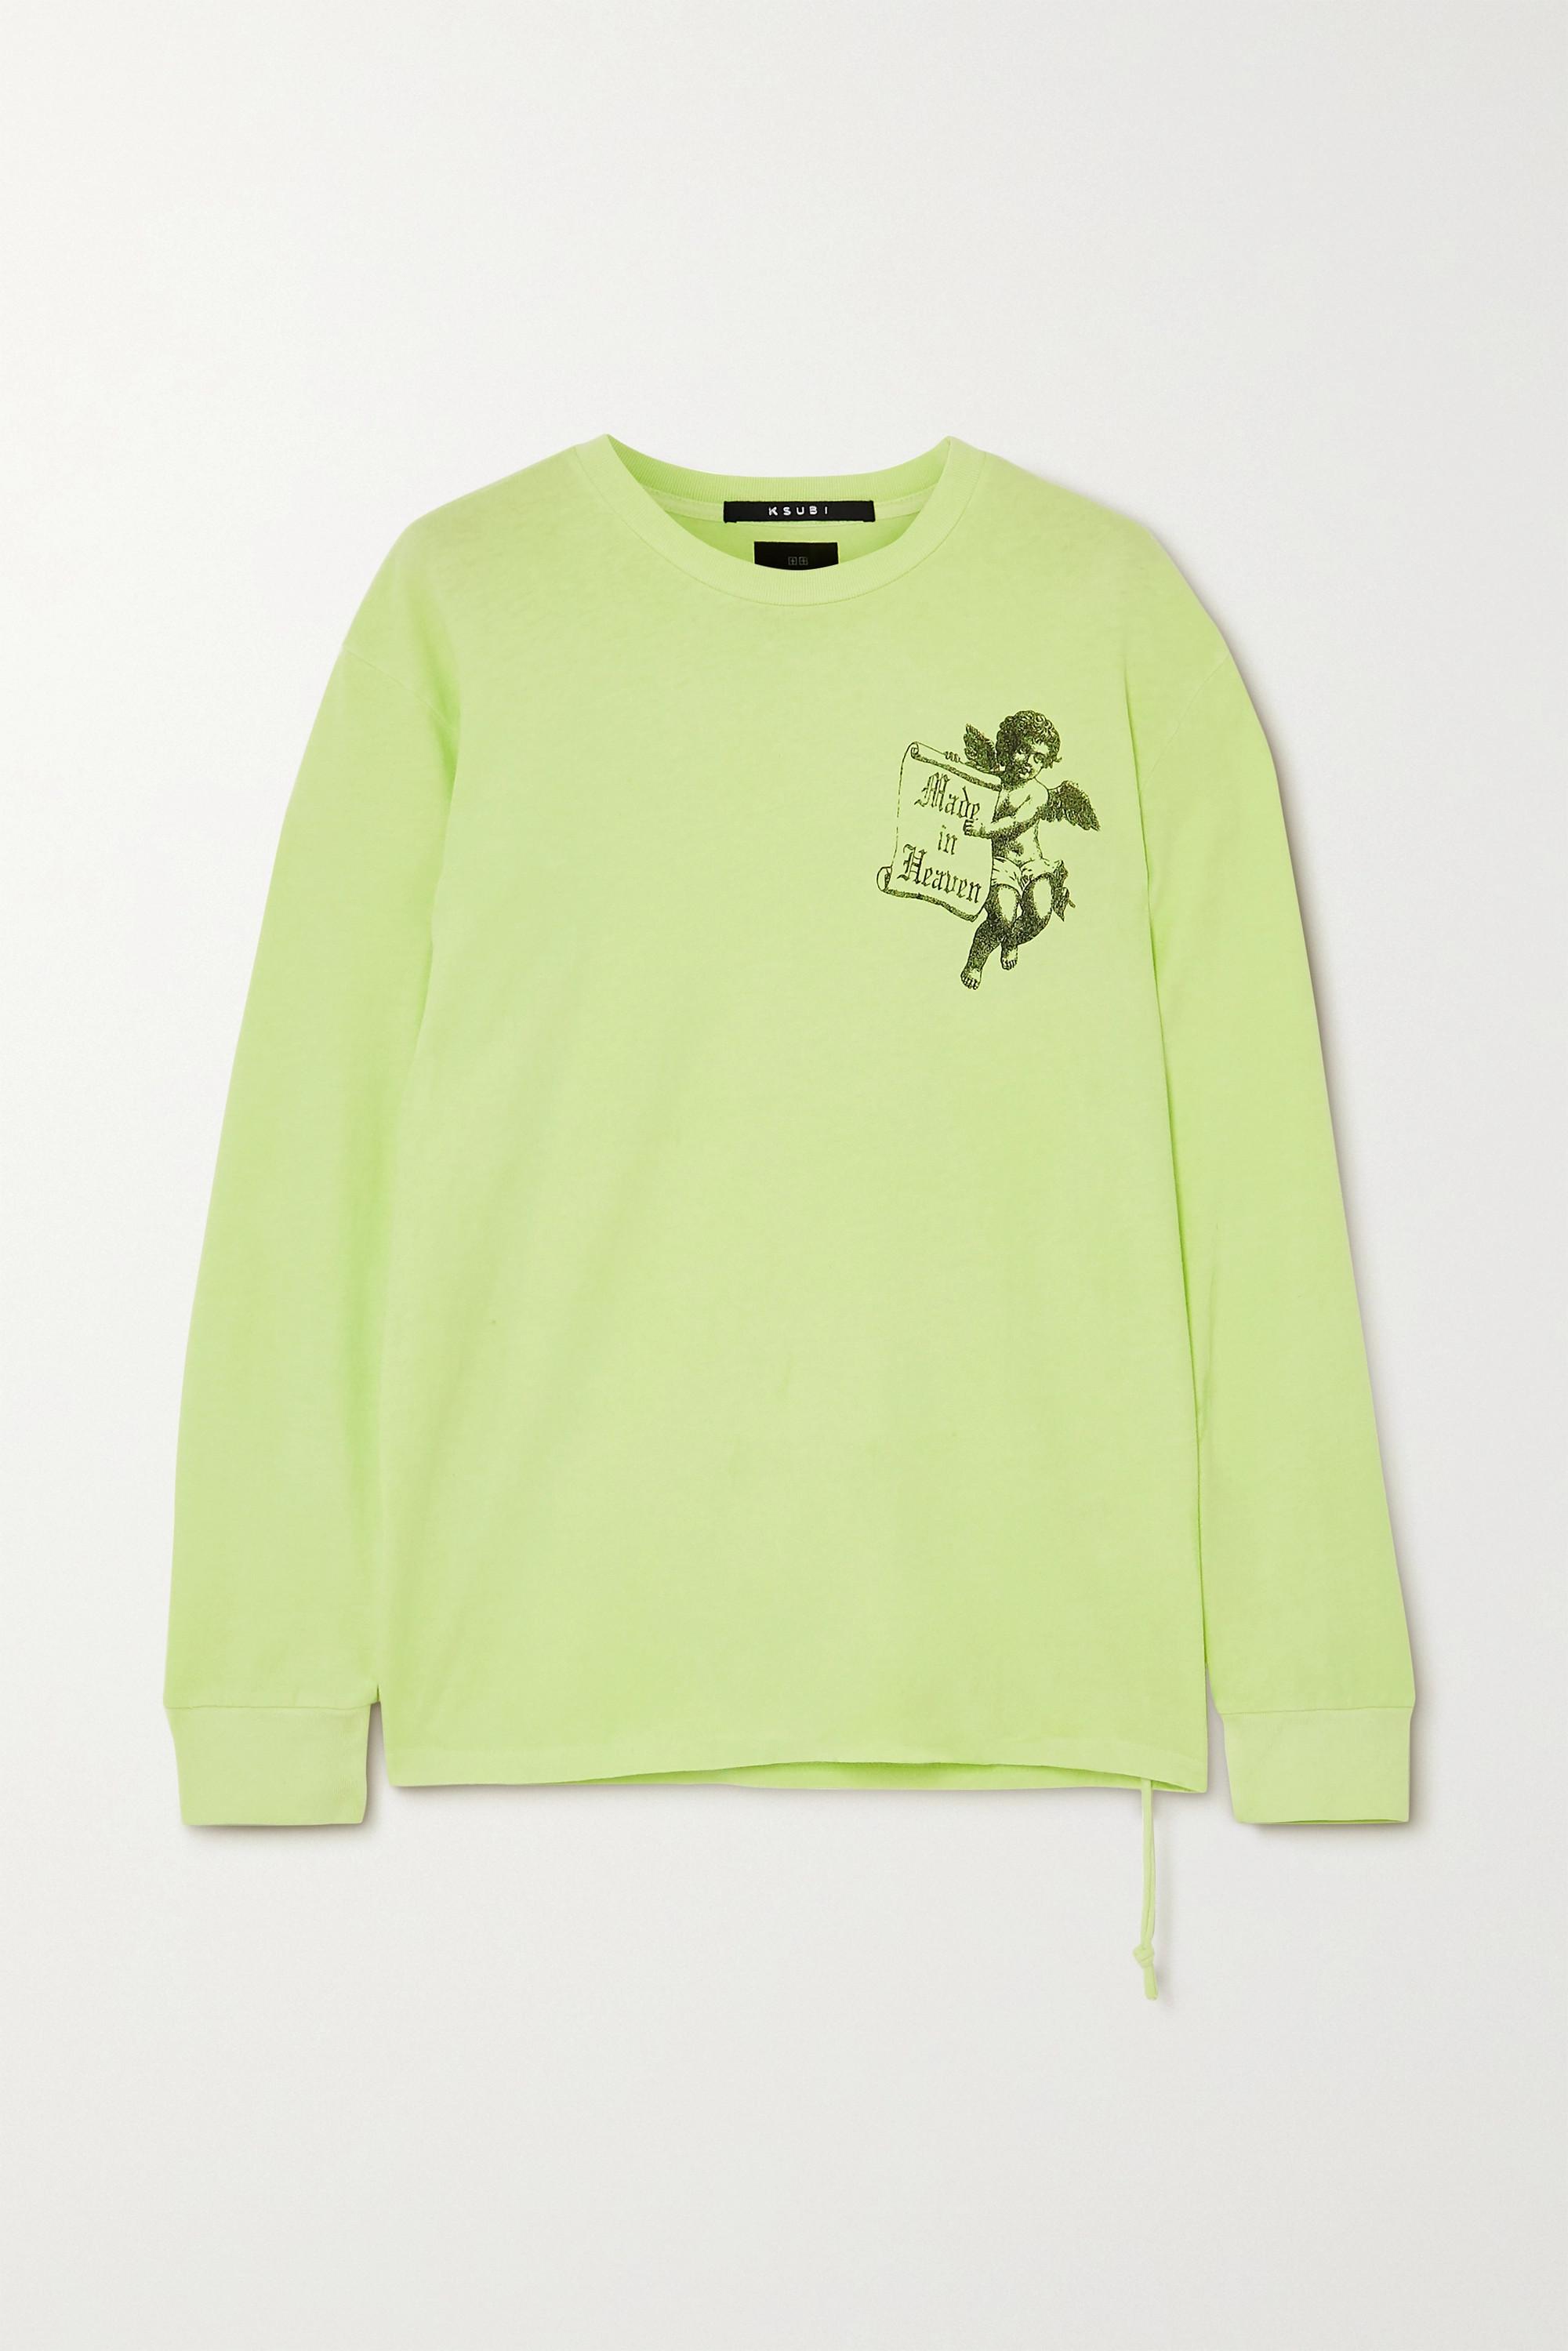 Ksubi Heaven printed cotton-jersey T-shirt